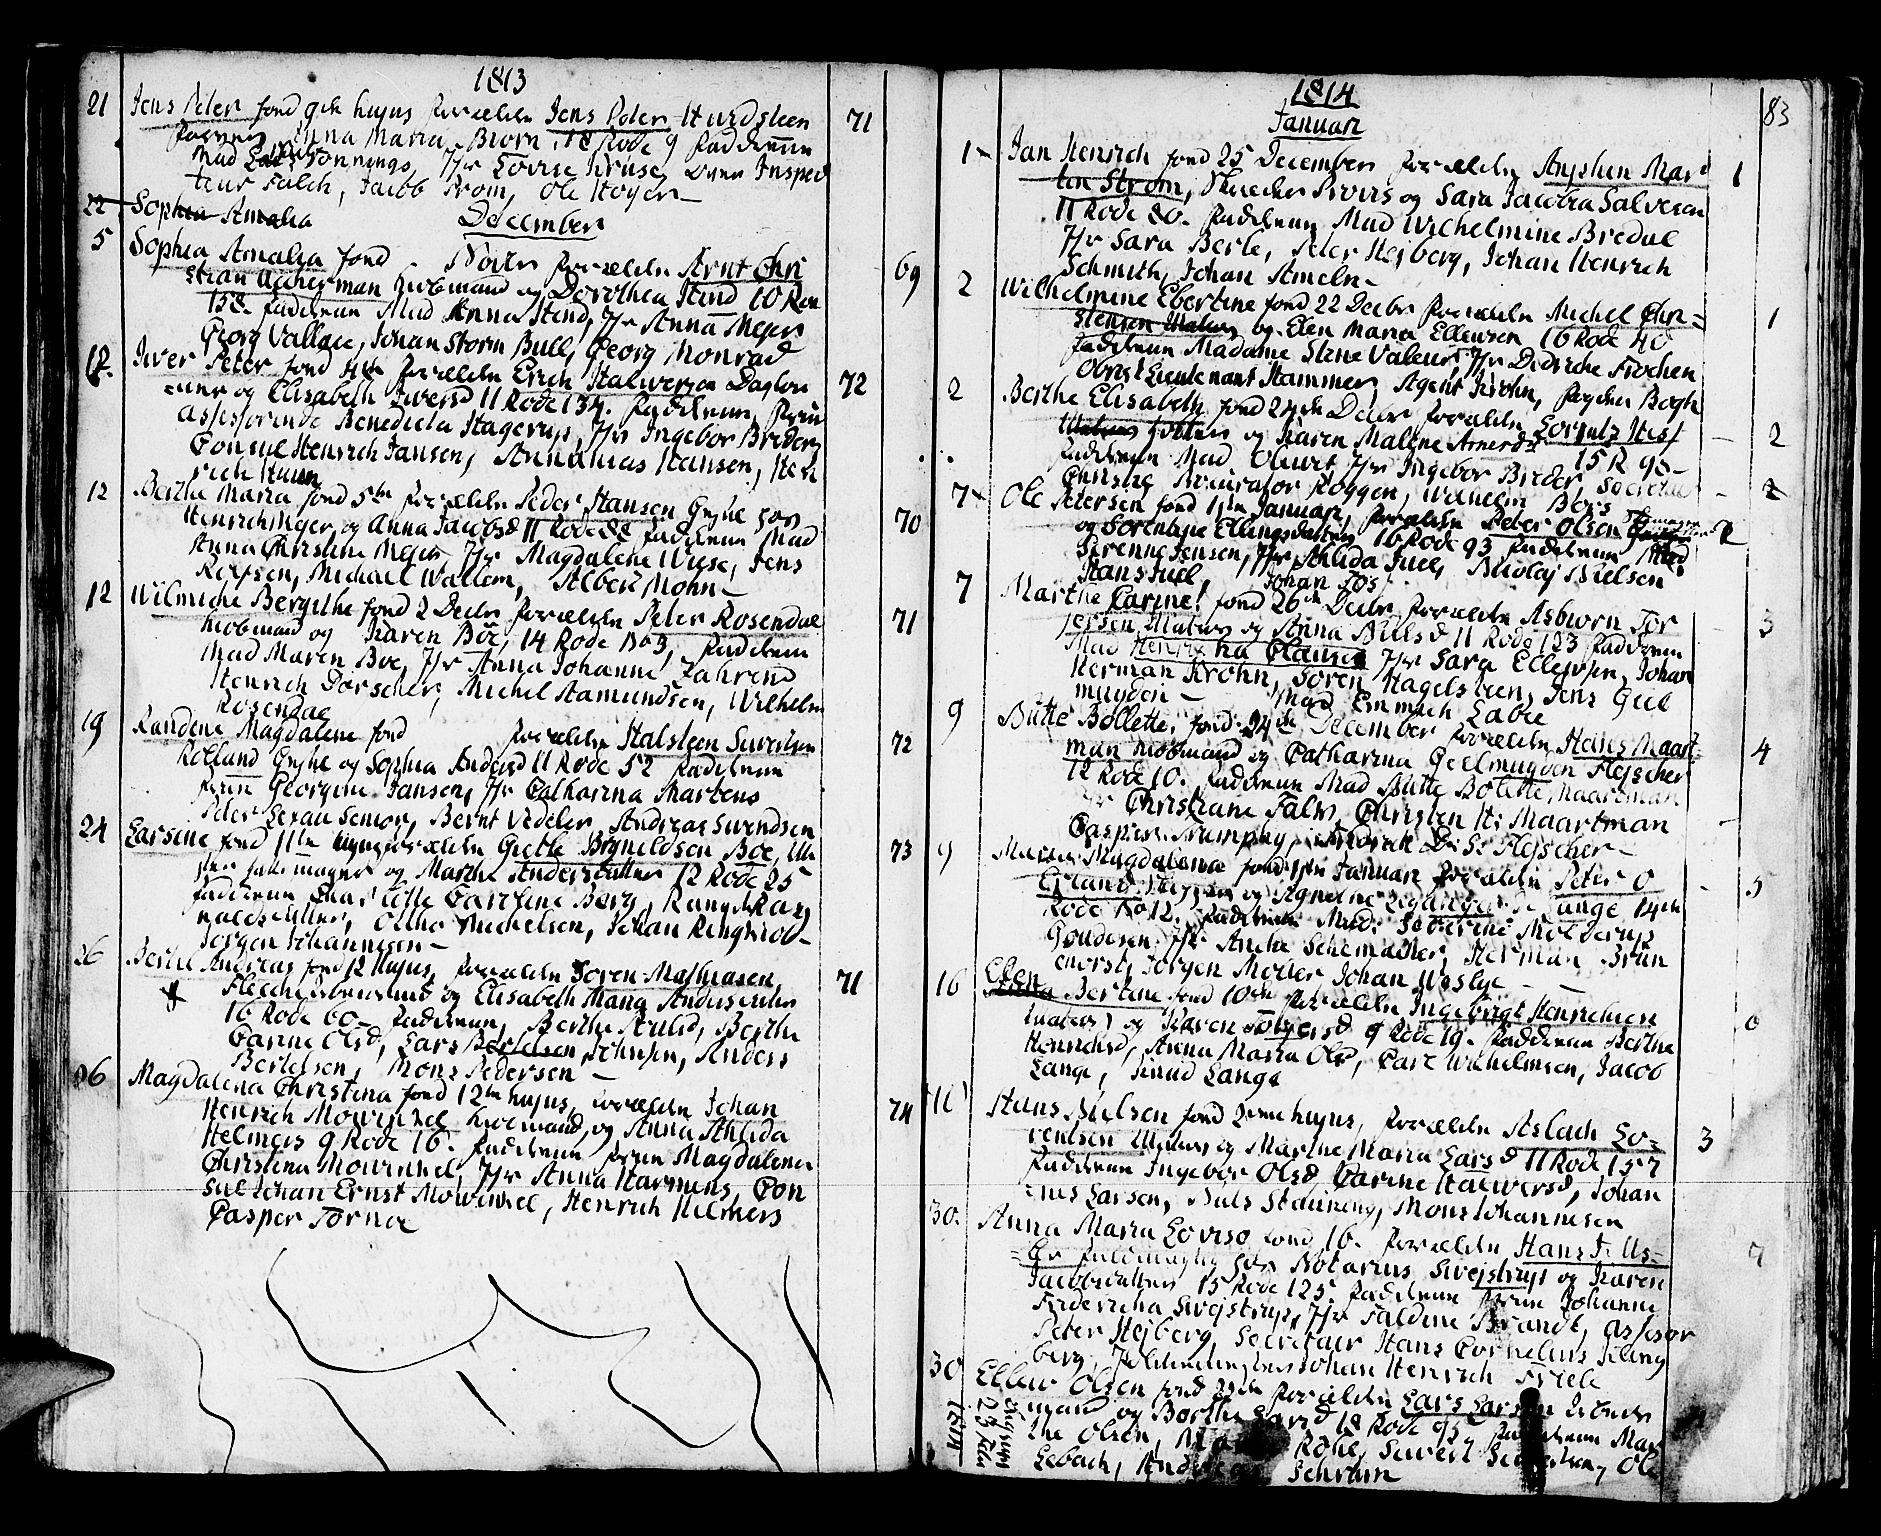 SAB, Domkirken Sokneprestembete, H/Haa/L0005: Ministerialbok nr. A 5, 1808-1820, s. 82-83